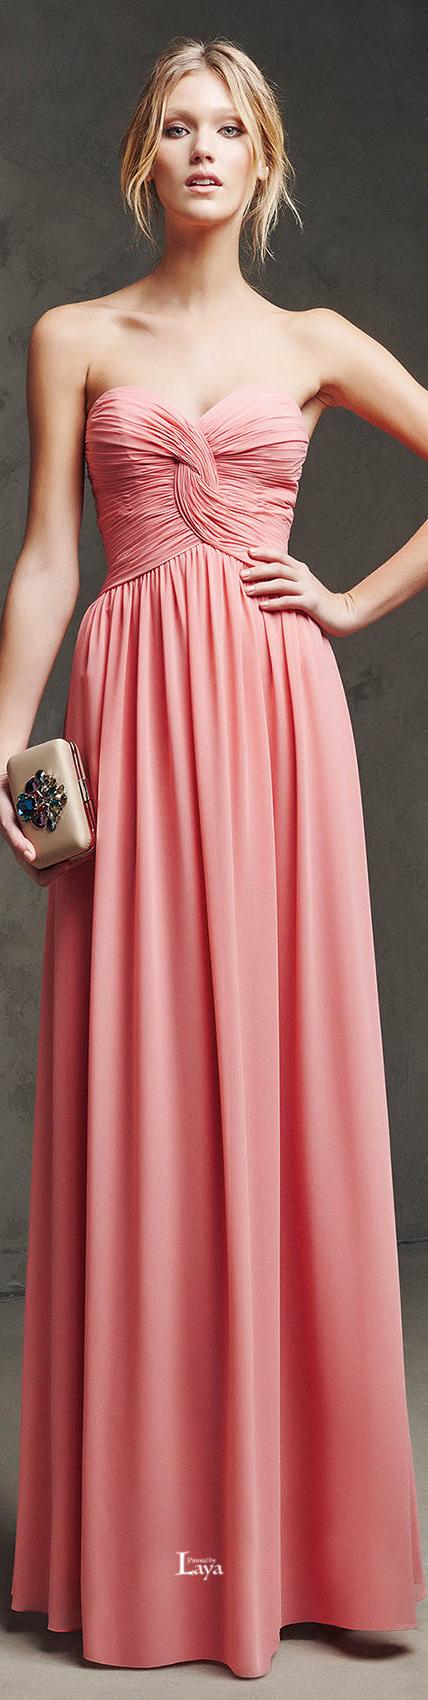 Pronovias 2016 EVENING Dresses | Fashion | Pinterest | Boda ...